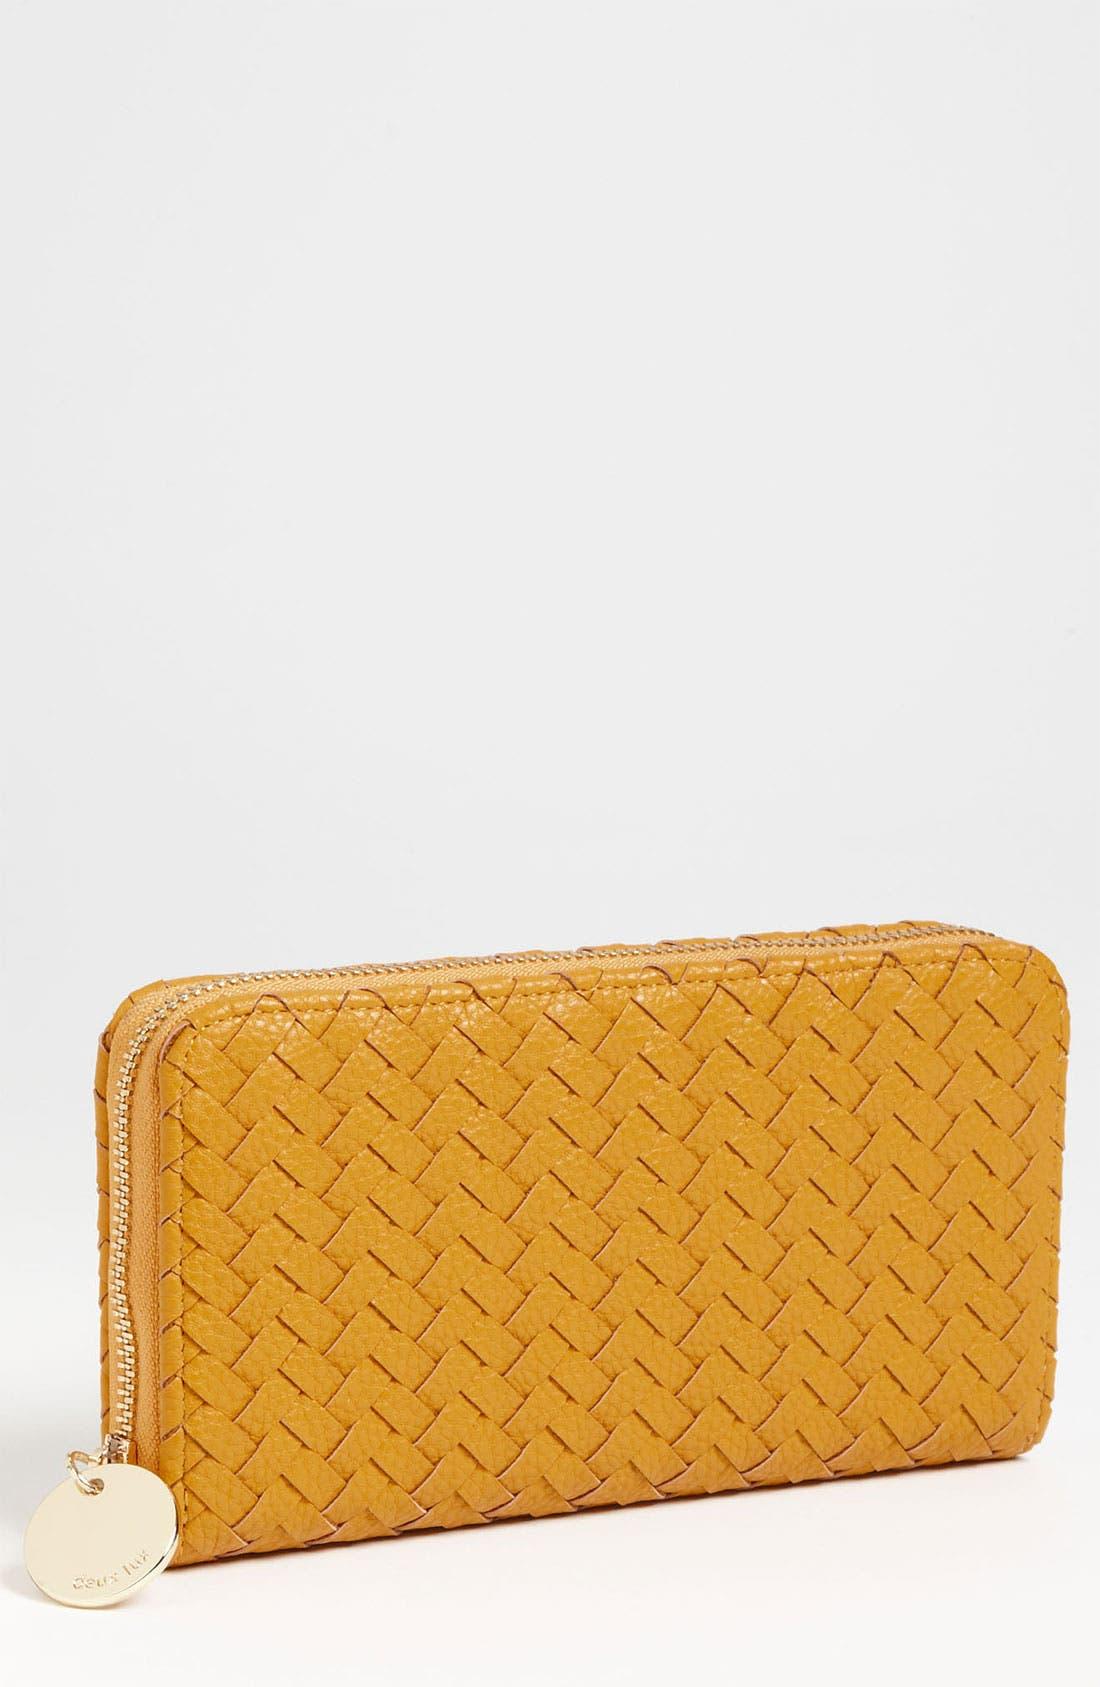 Main Image - Deux Lux 'Gramercy' Wallet